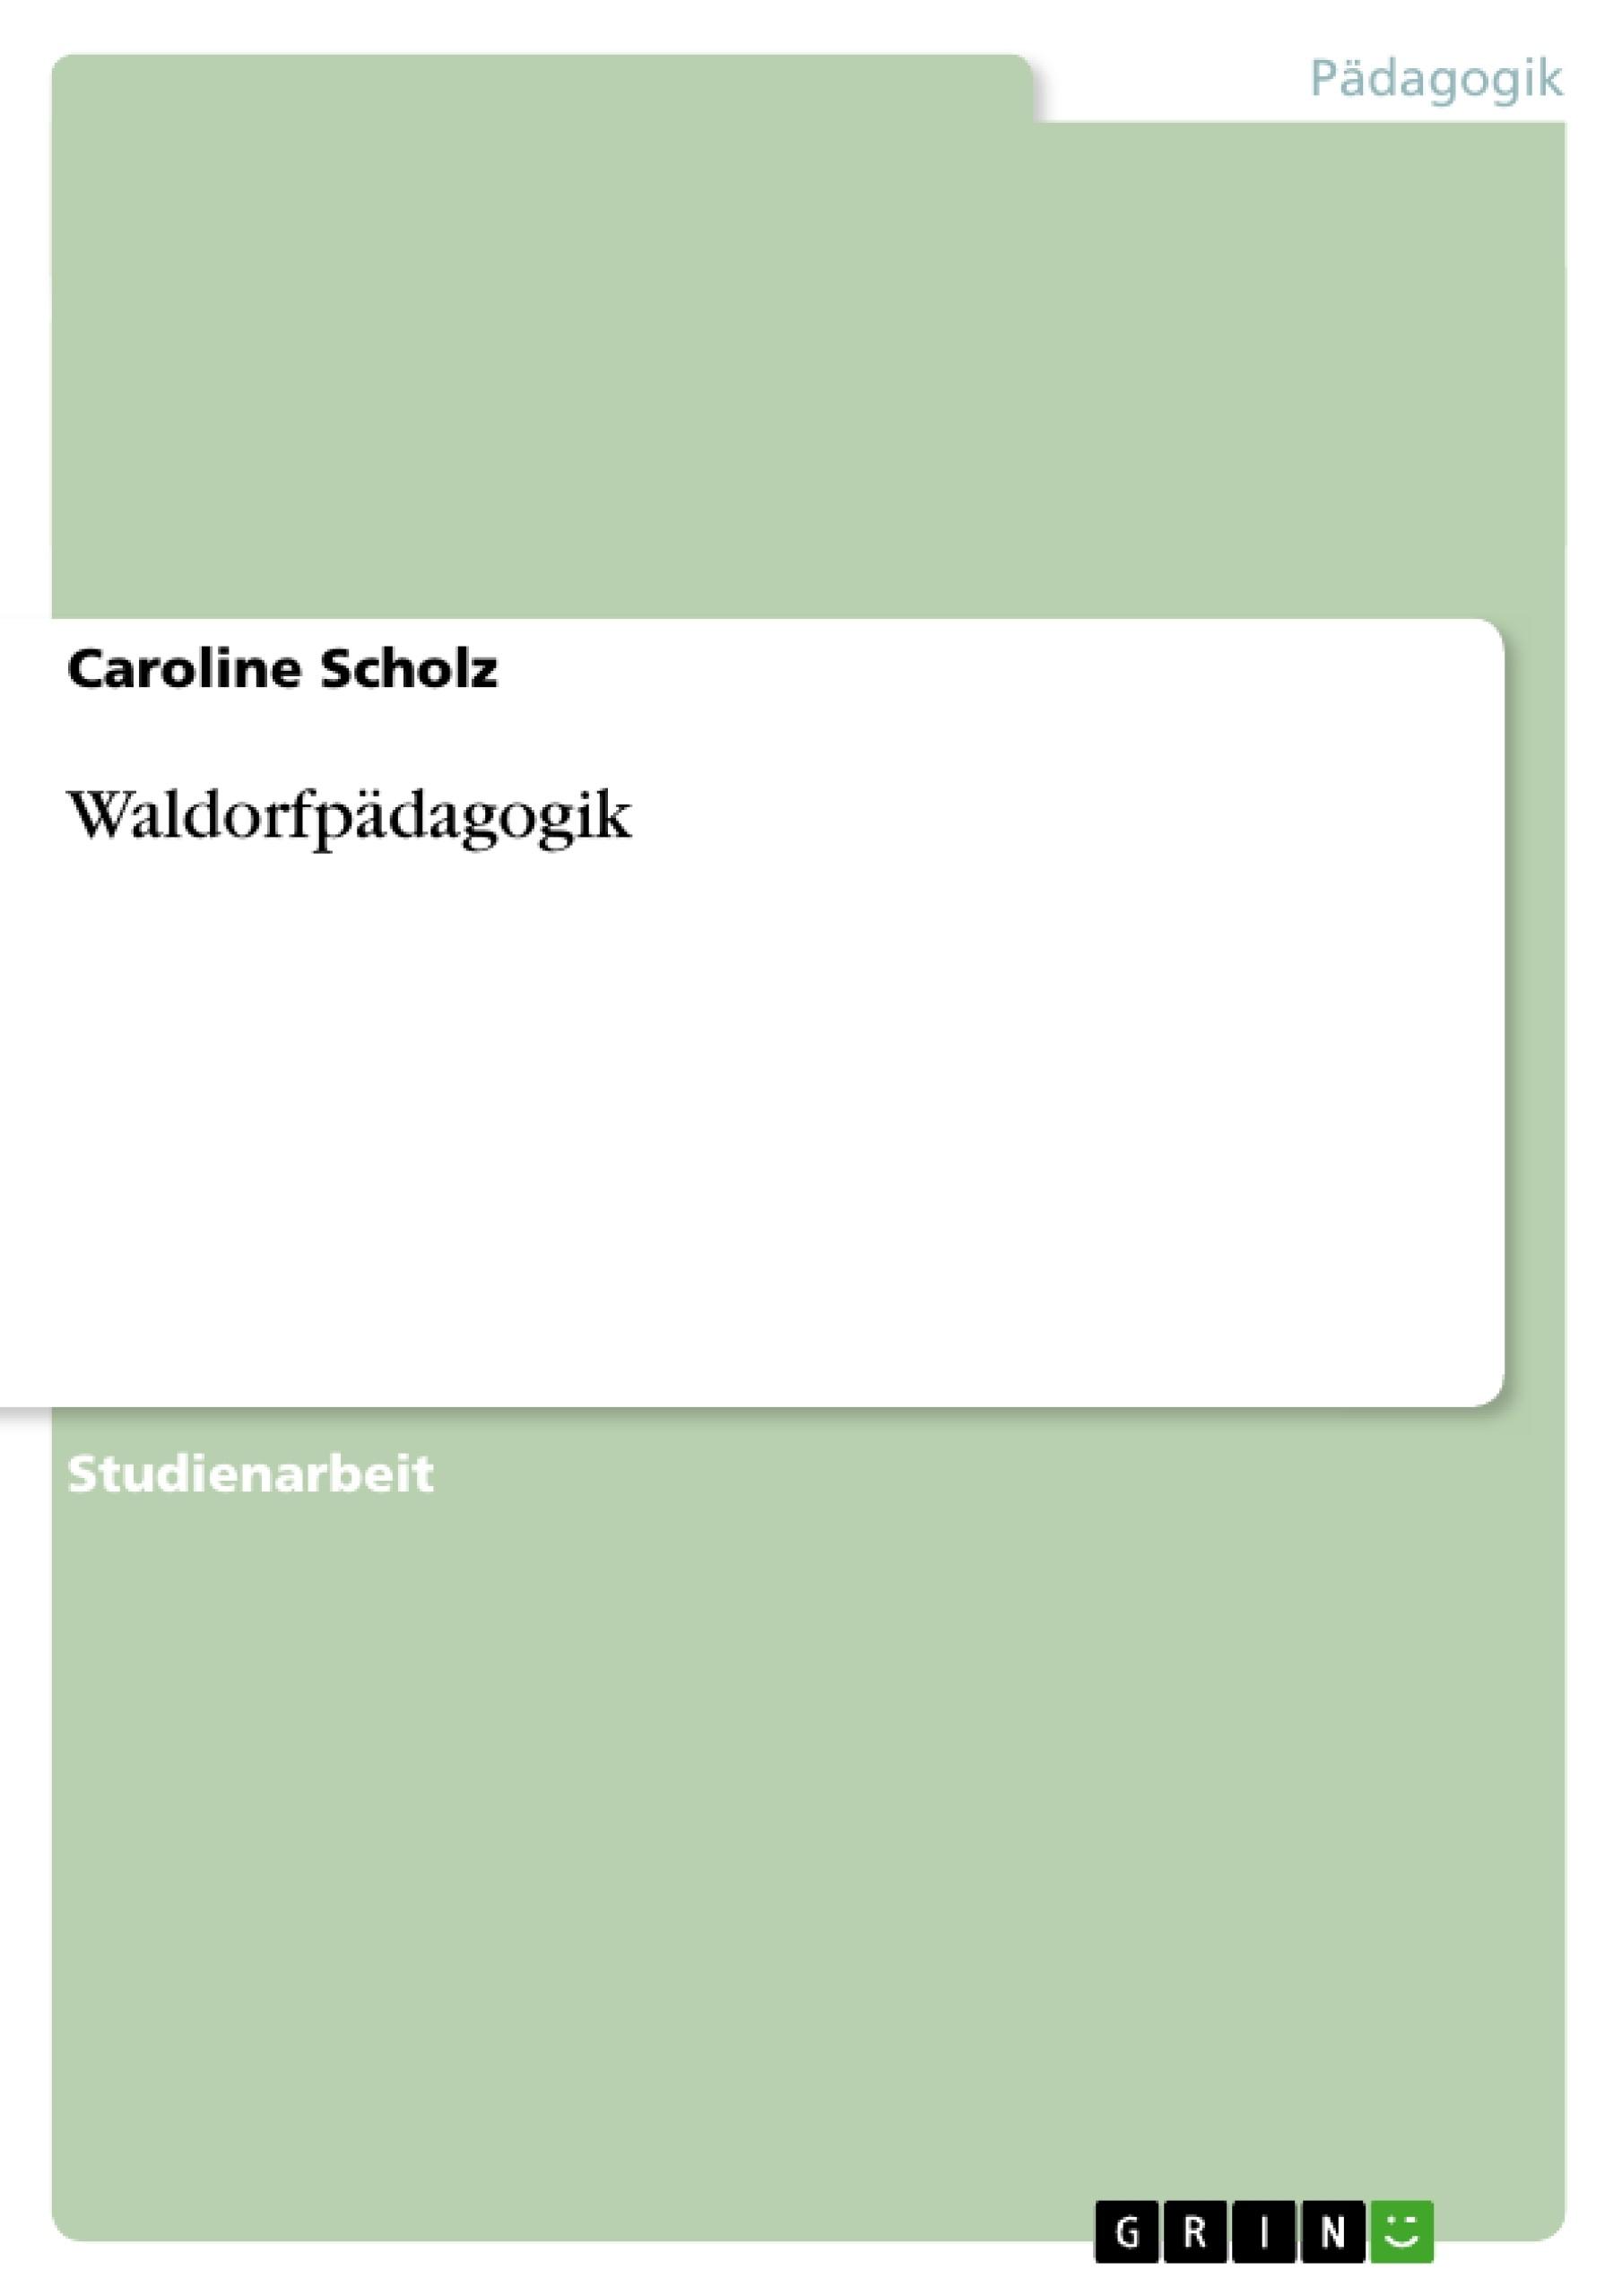 Titel: Waldorfpädagogik